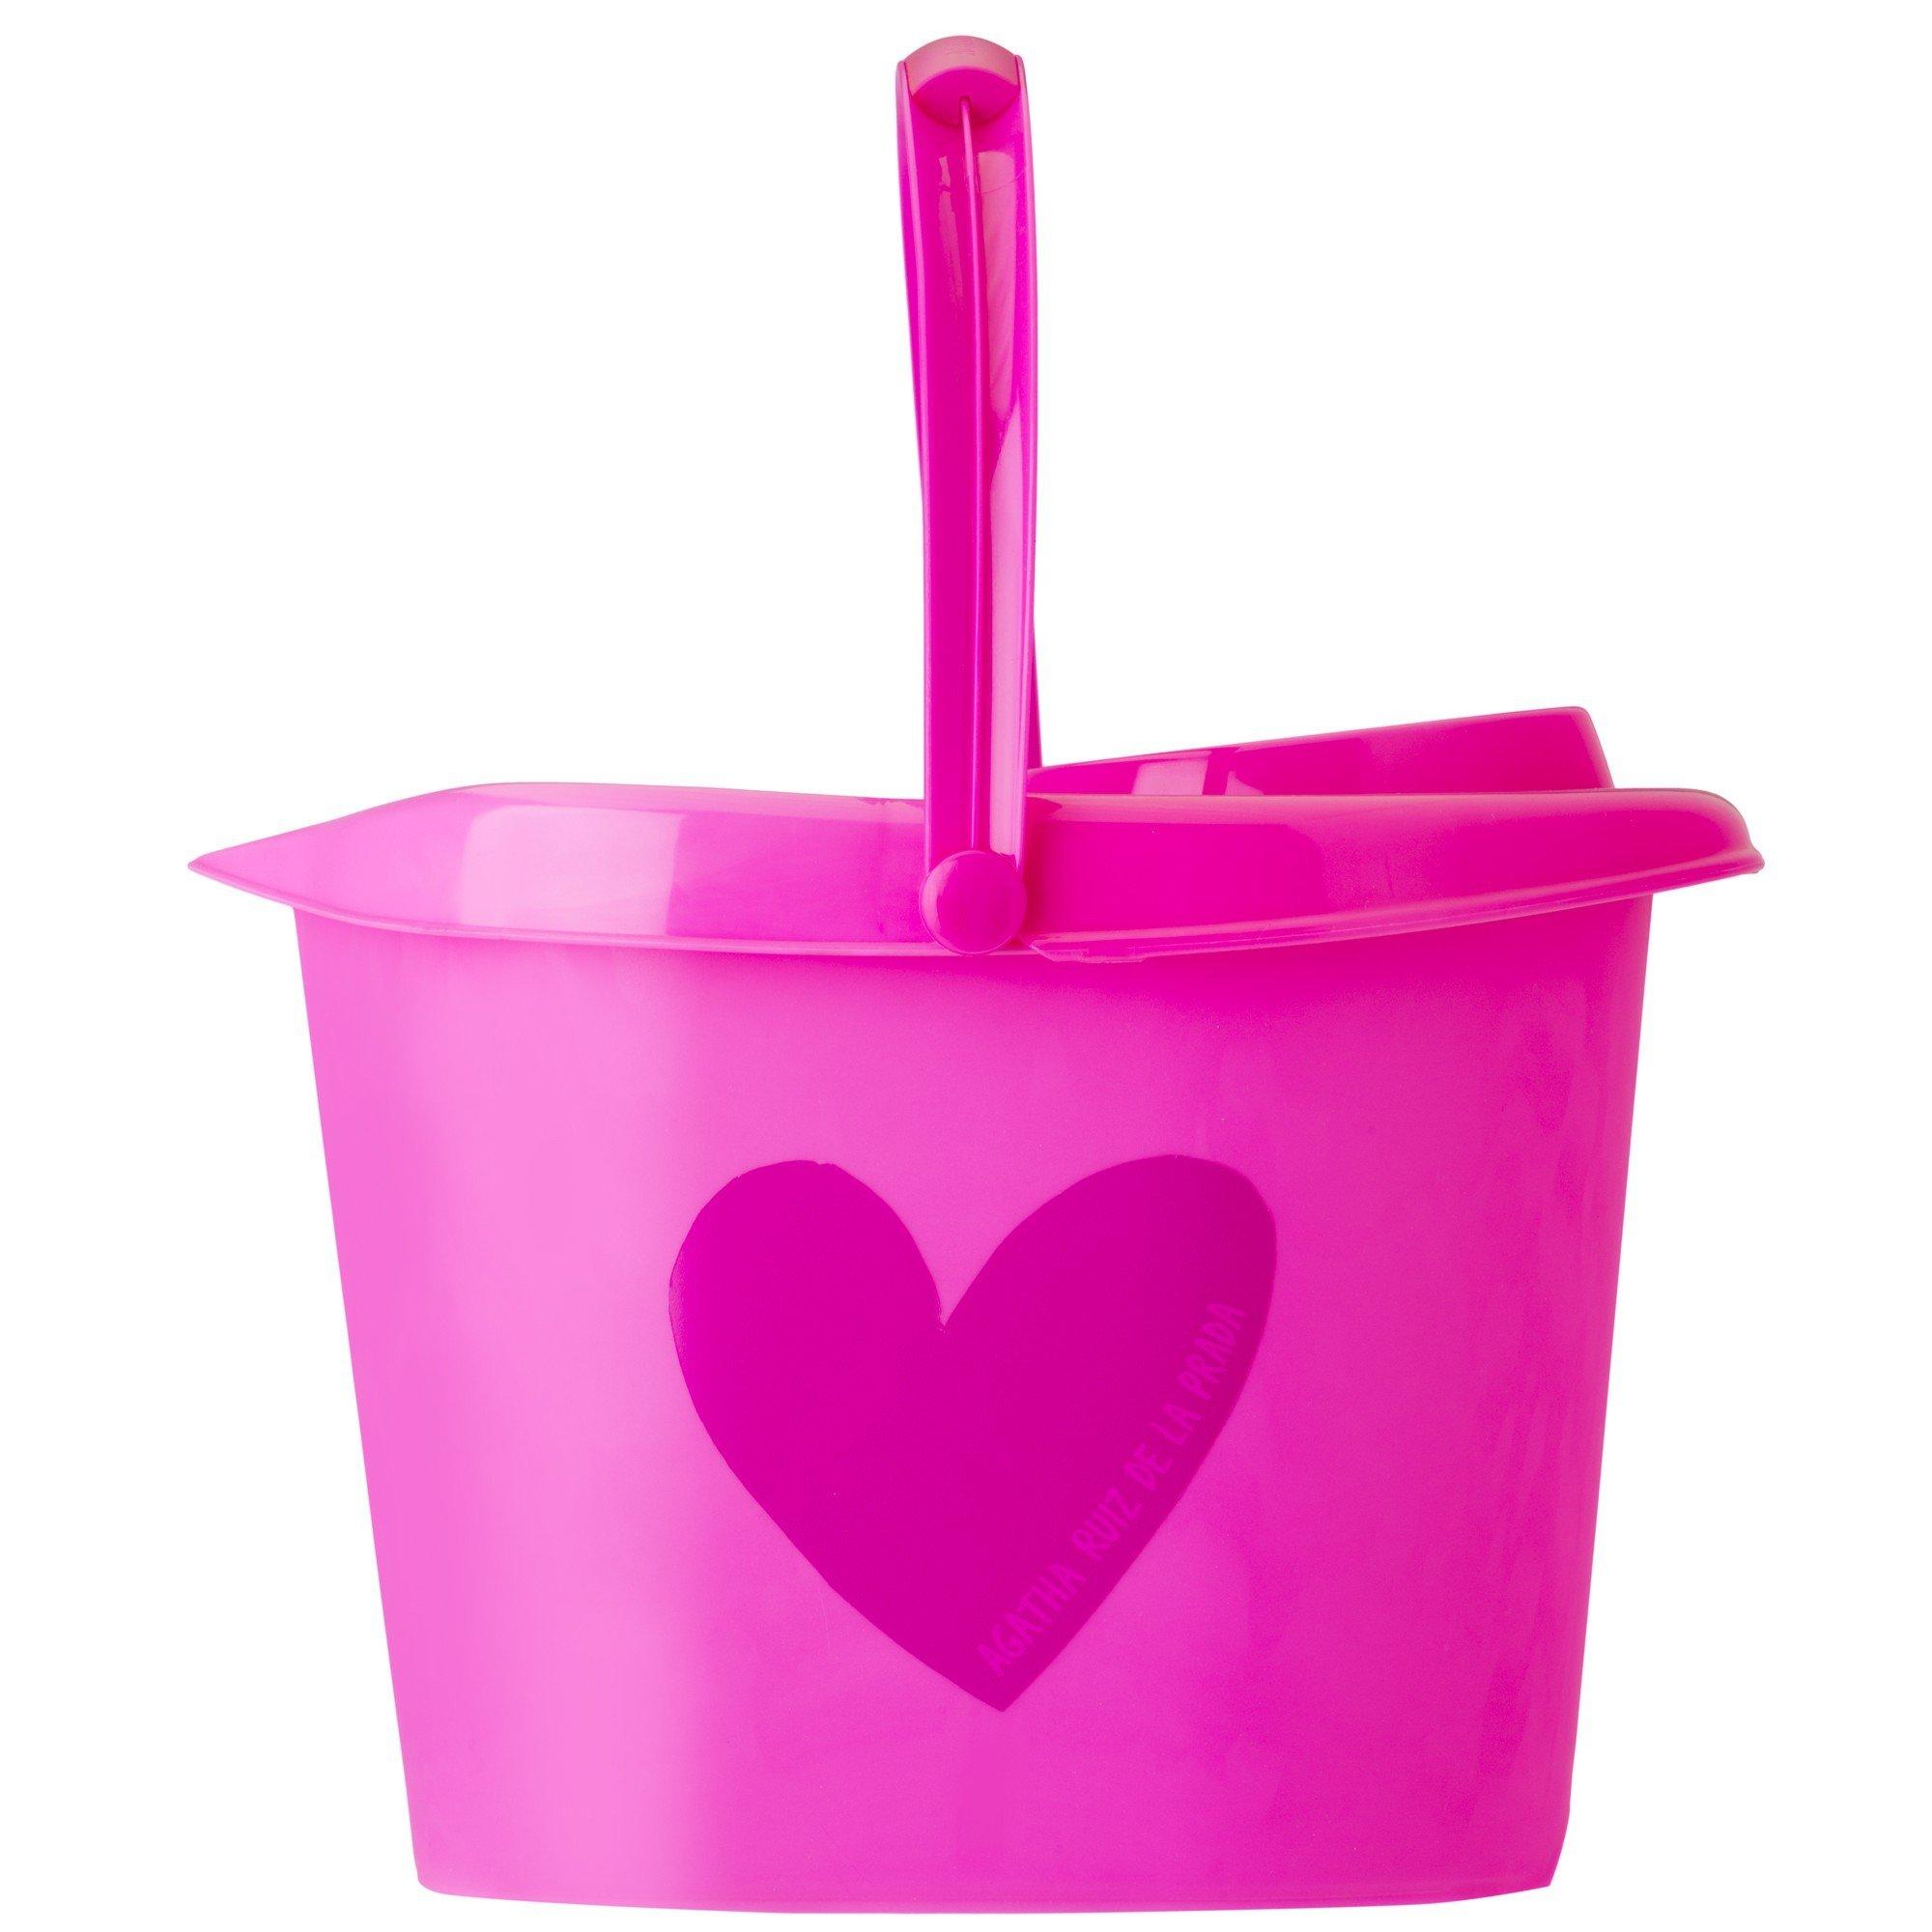 Vigar ARP Rectangular Bucket with Wringer 12 Litre, Color-Pink, One Size